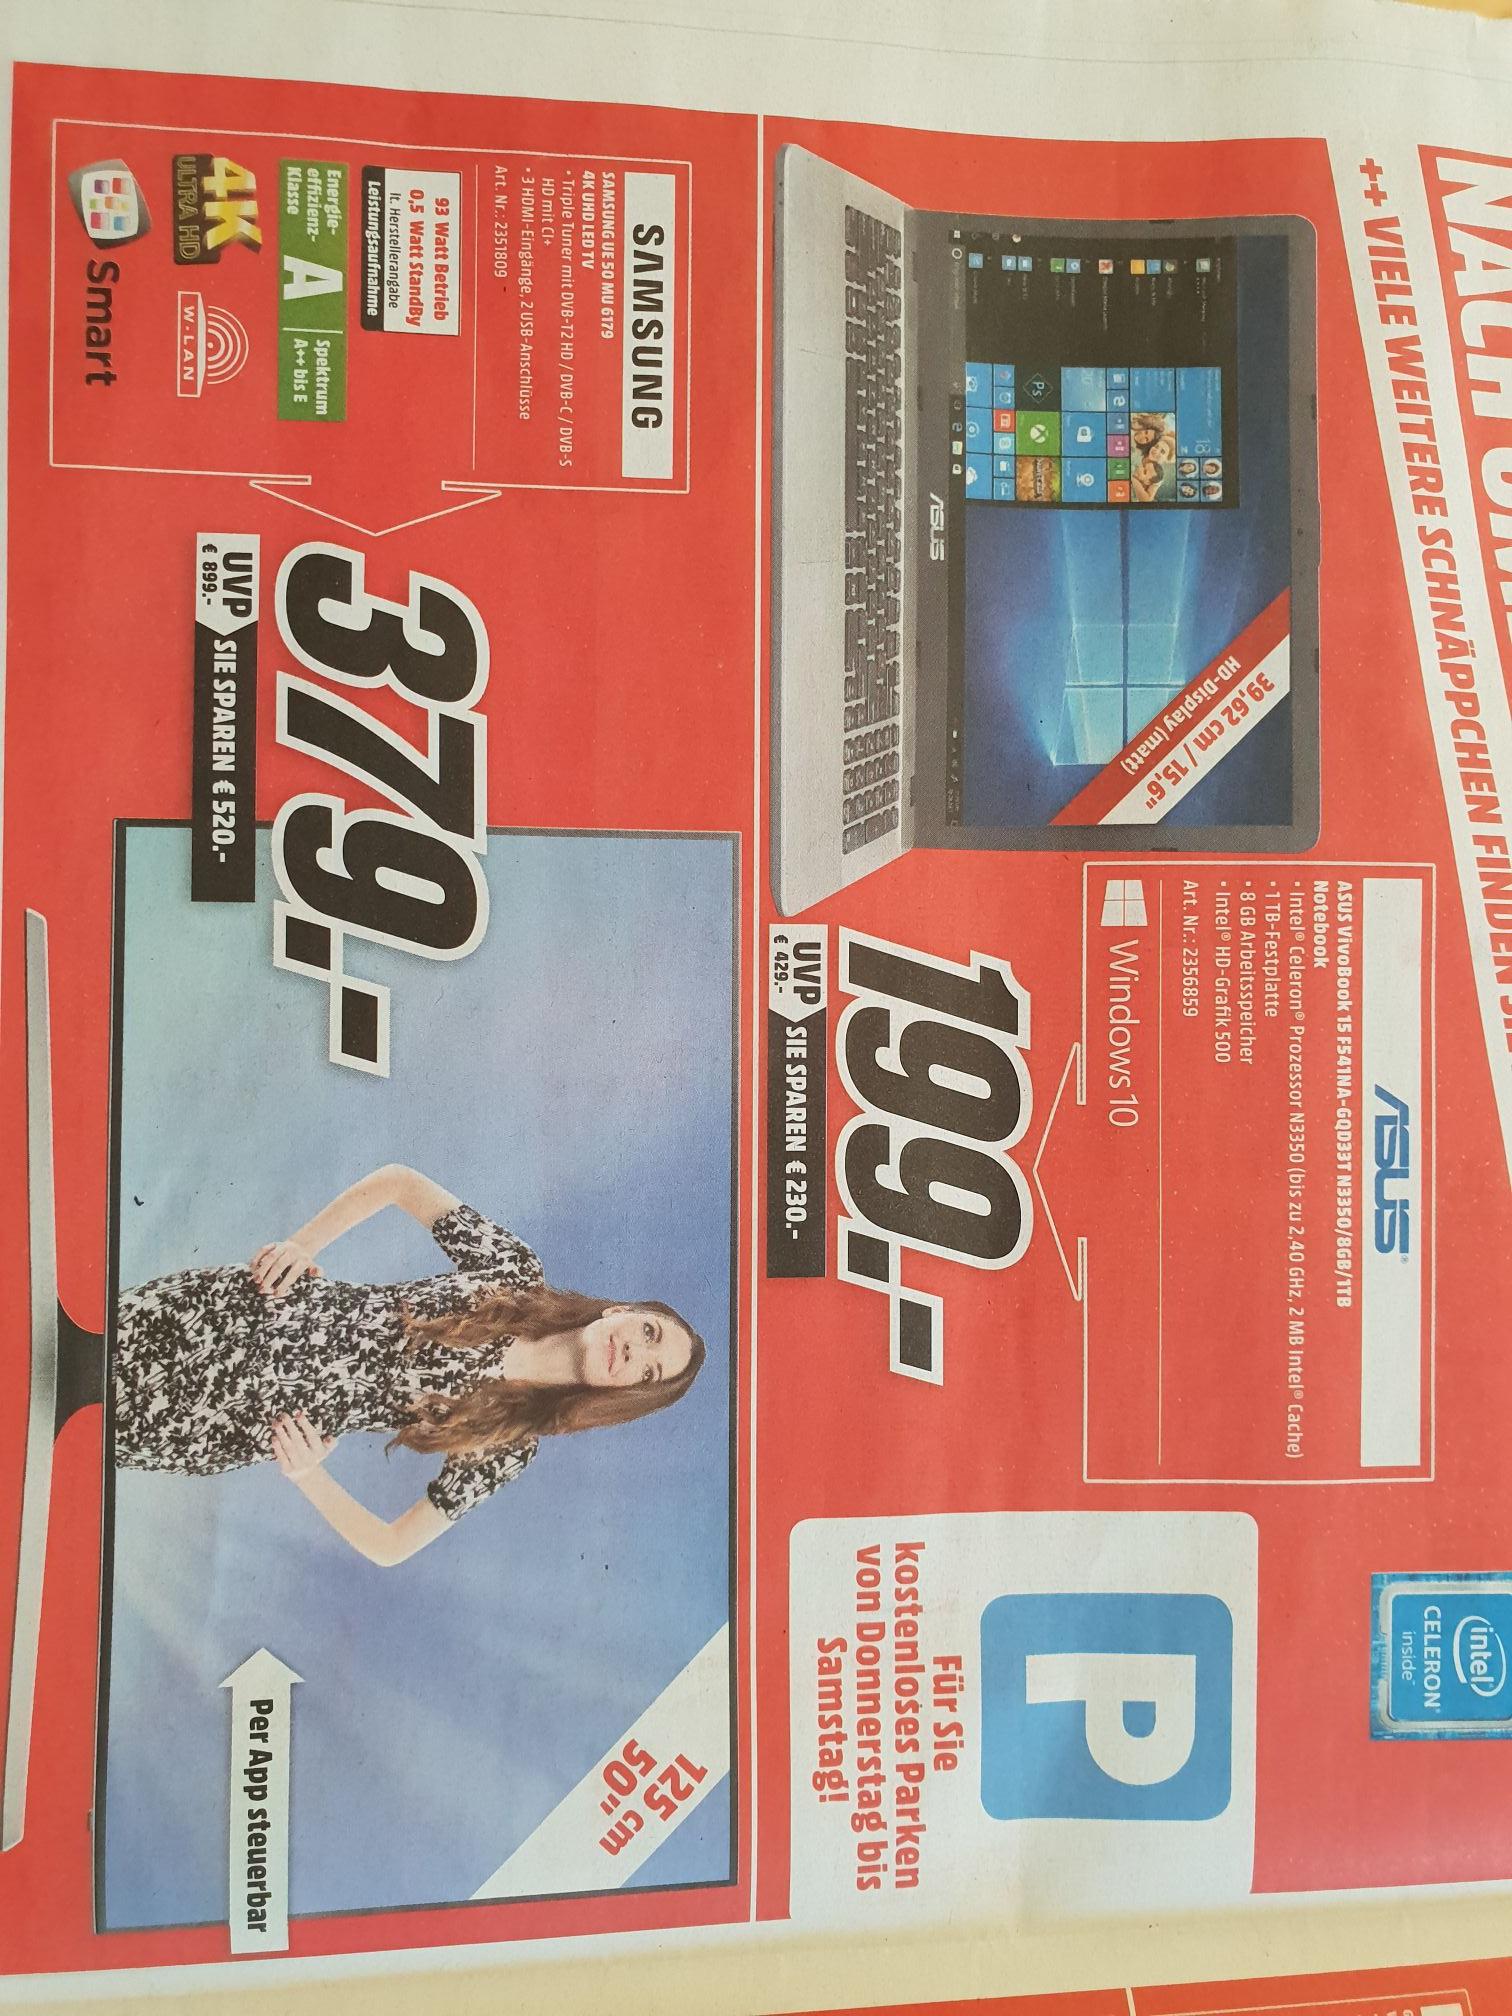 (Lokal) Samsung UE50MU6179 Media Markt München Haidhausen